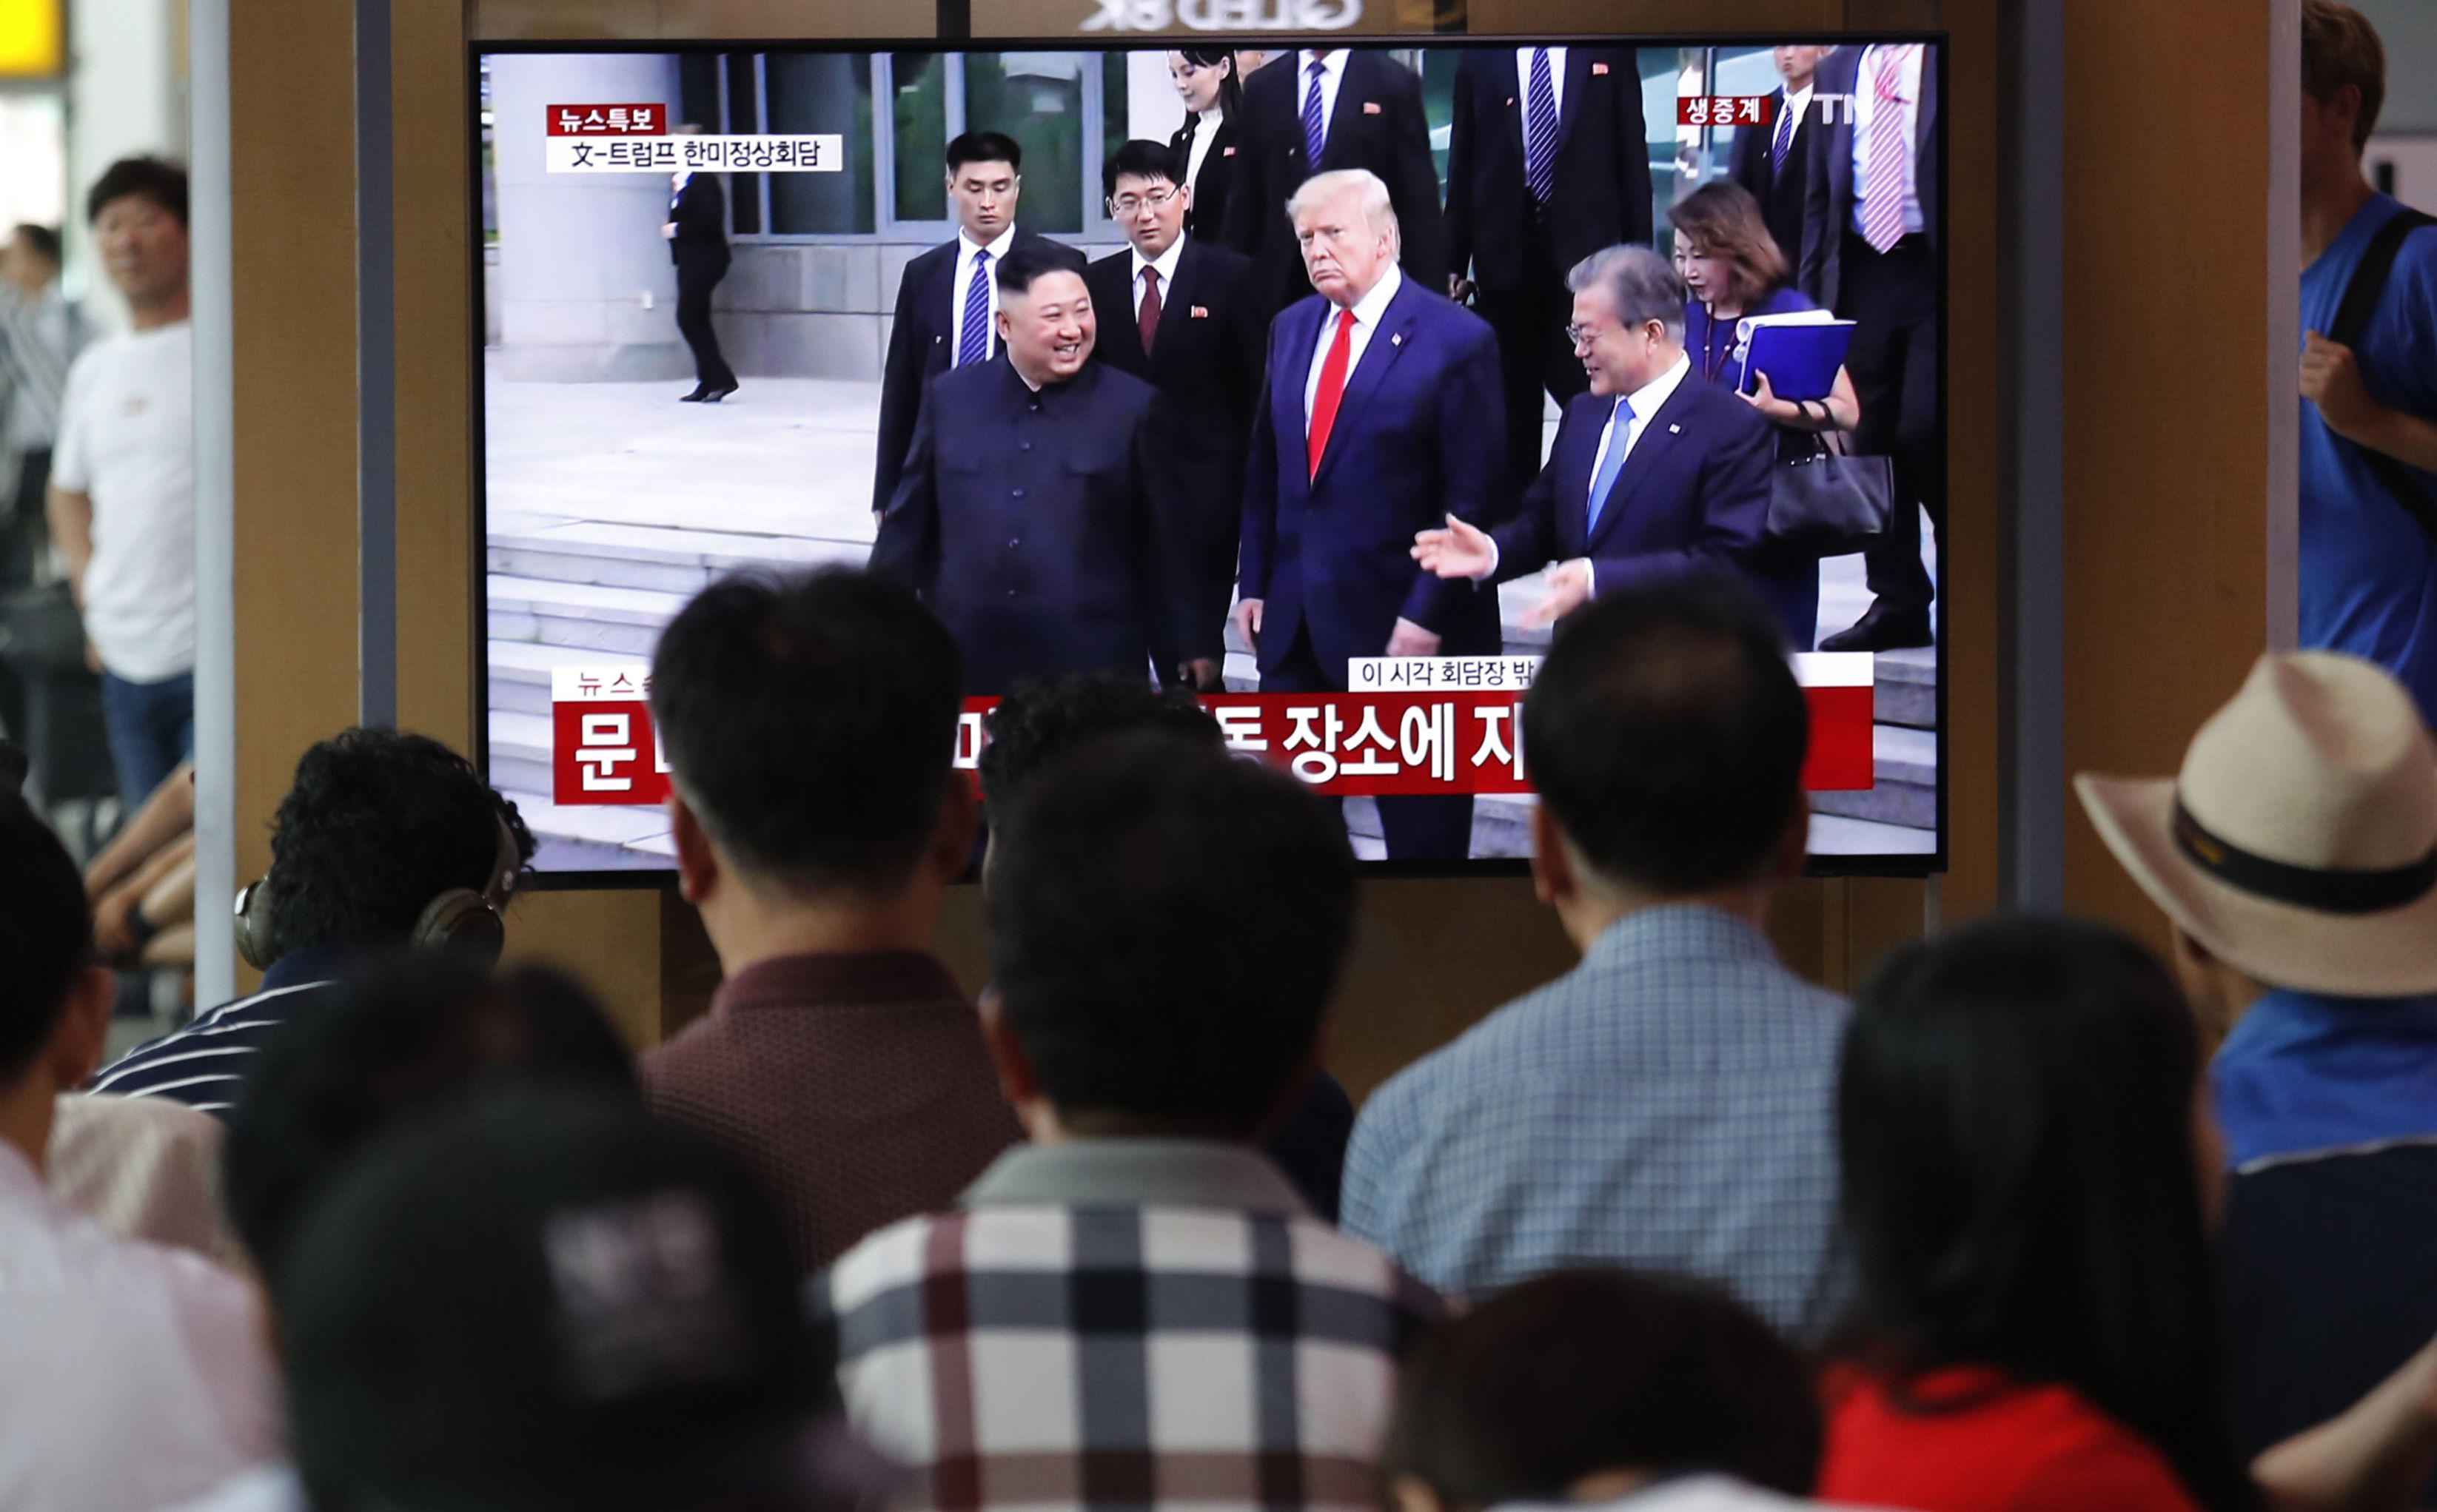 Kim Jong-un/ Donald Trump/ Moon Jae-in